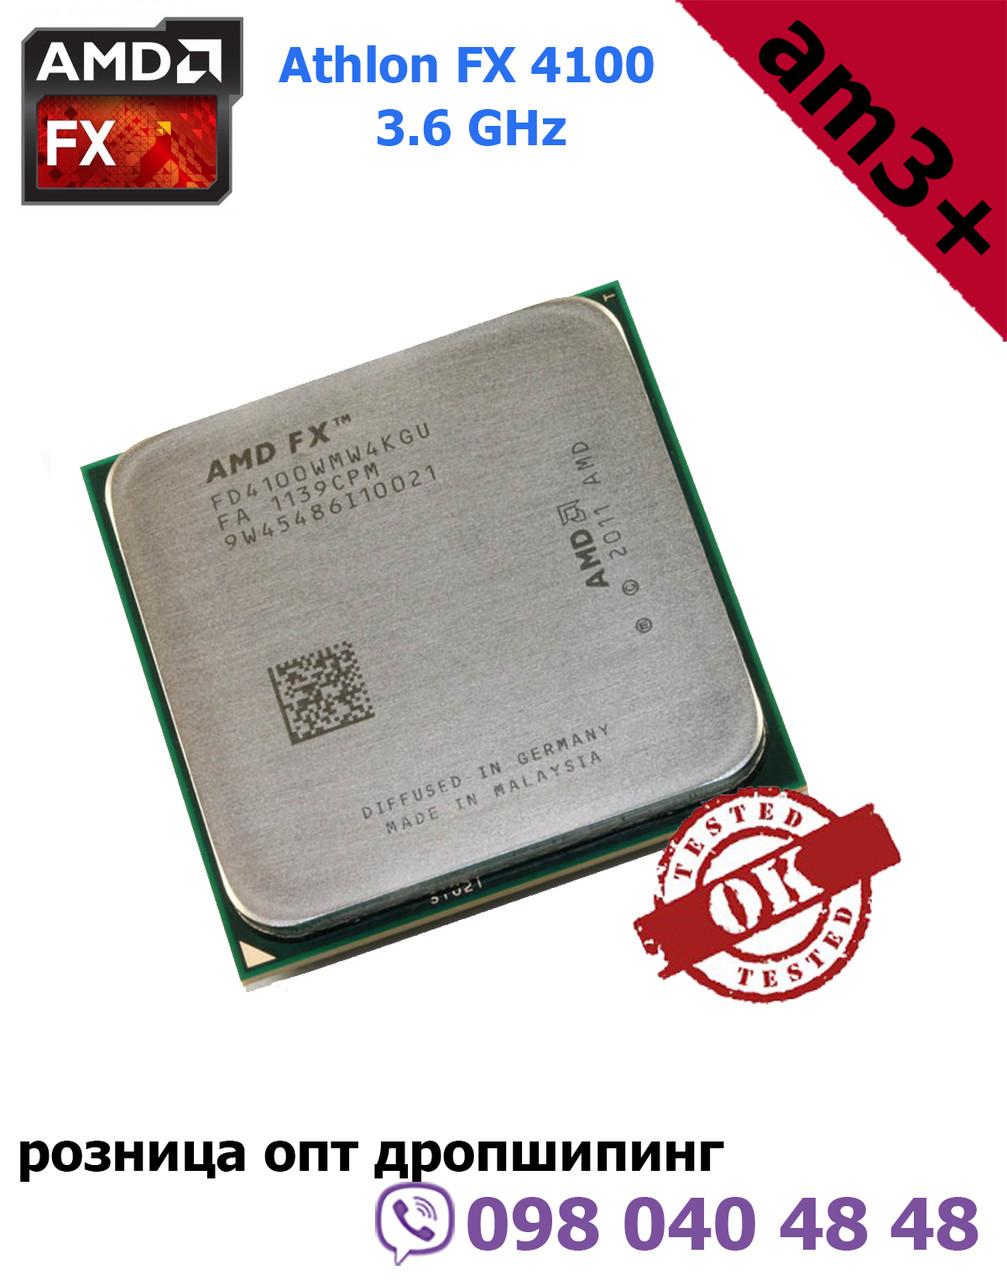 Процессор AMD Athlon FX 4100, 4 ядра, 3.6 ГГц, AM3+